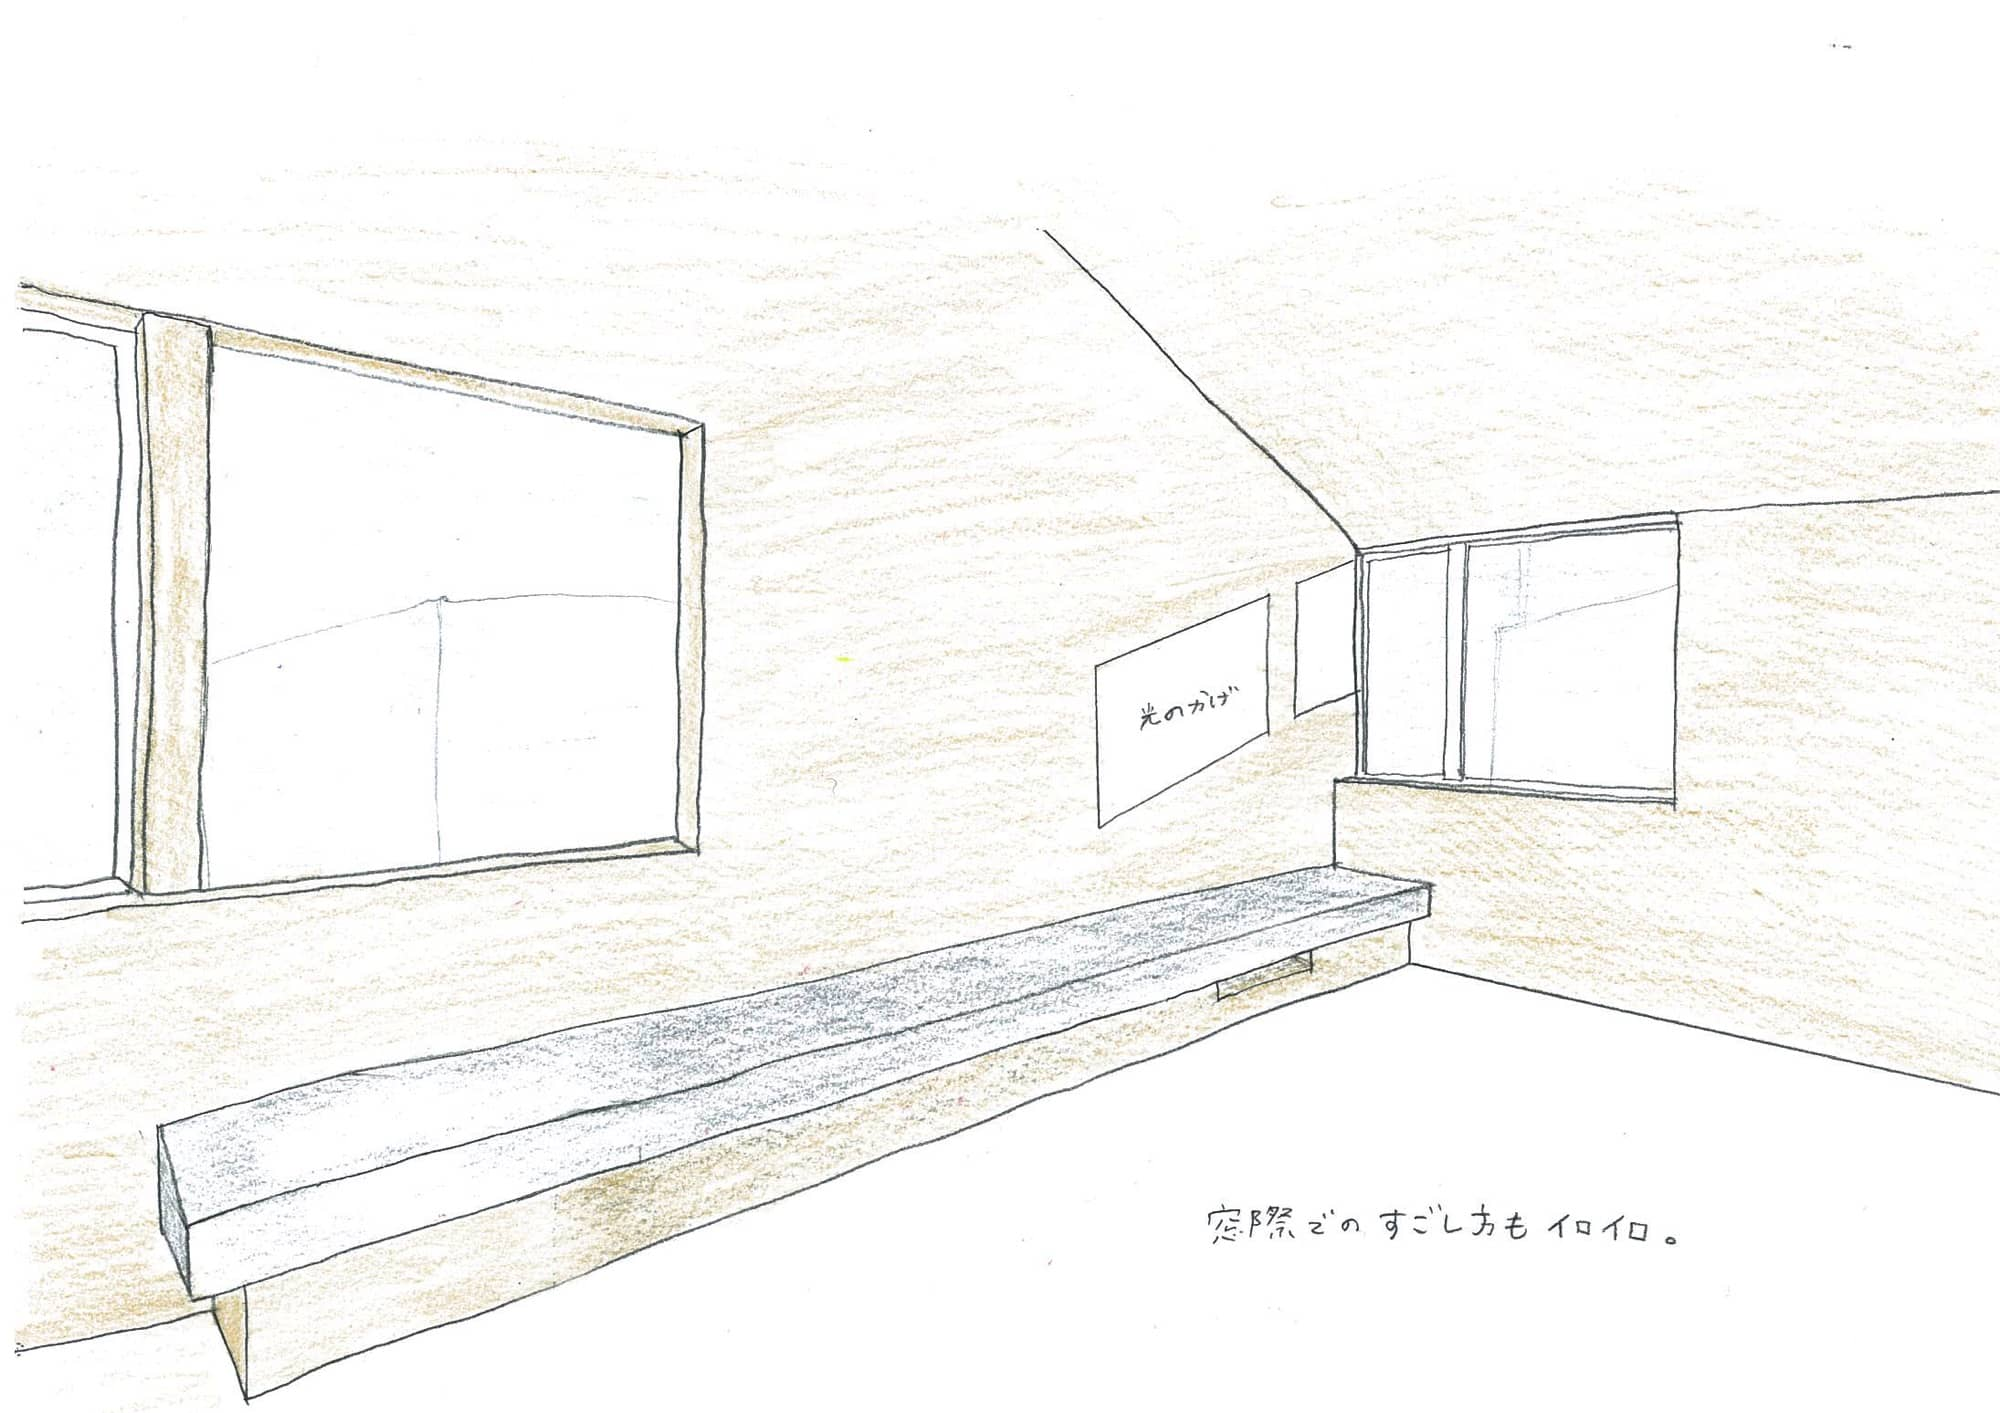 【TIME】家づくりストーリー第3話『窓際での過ごし方』